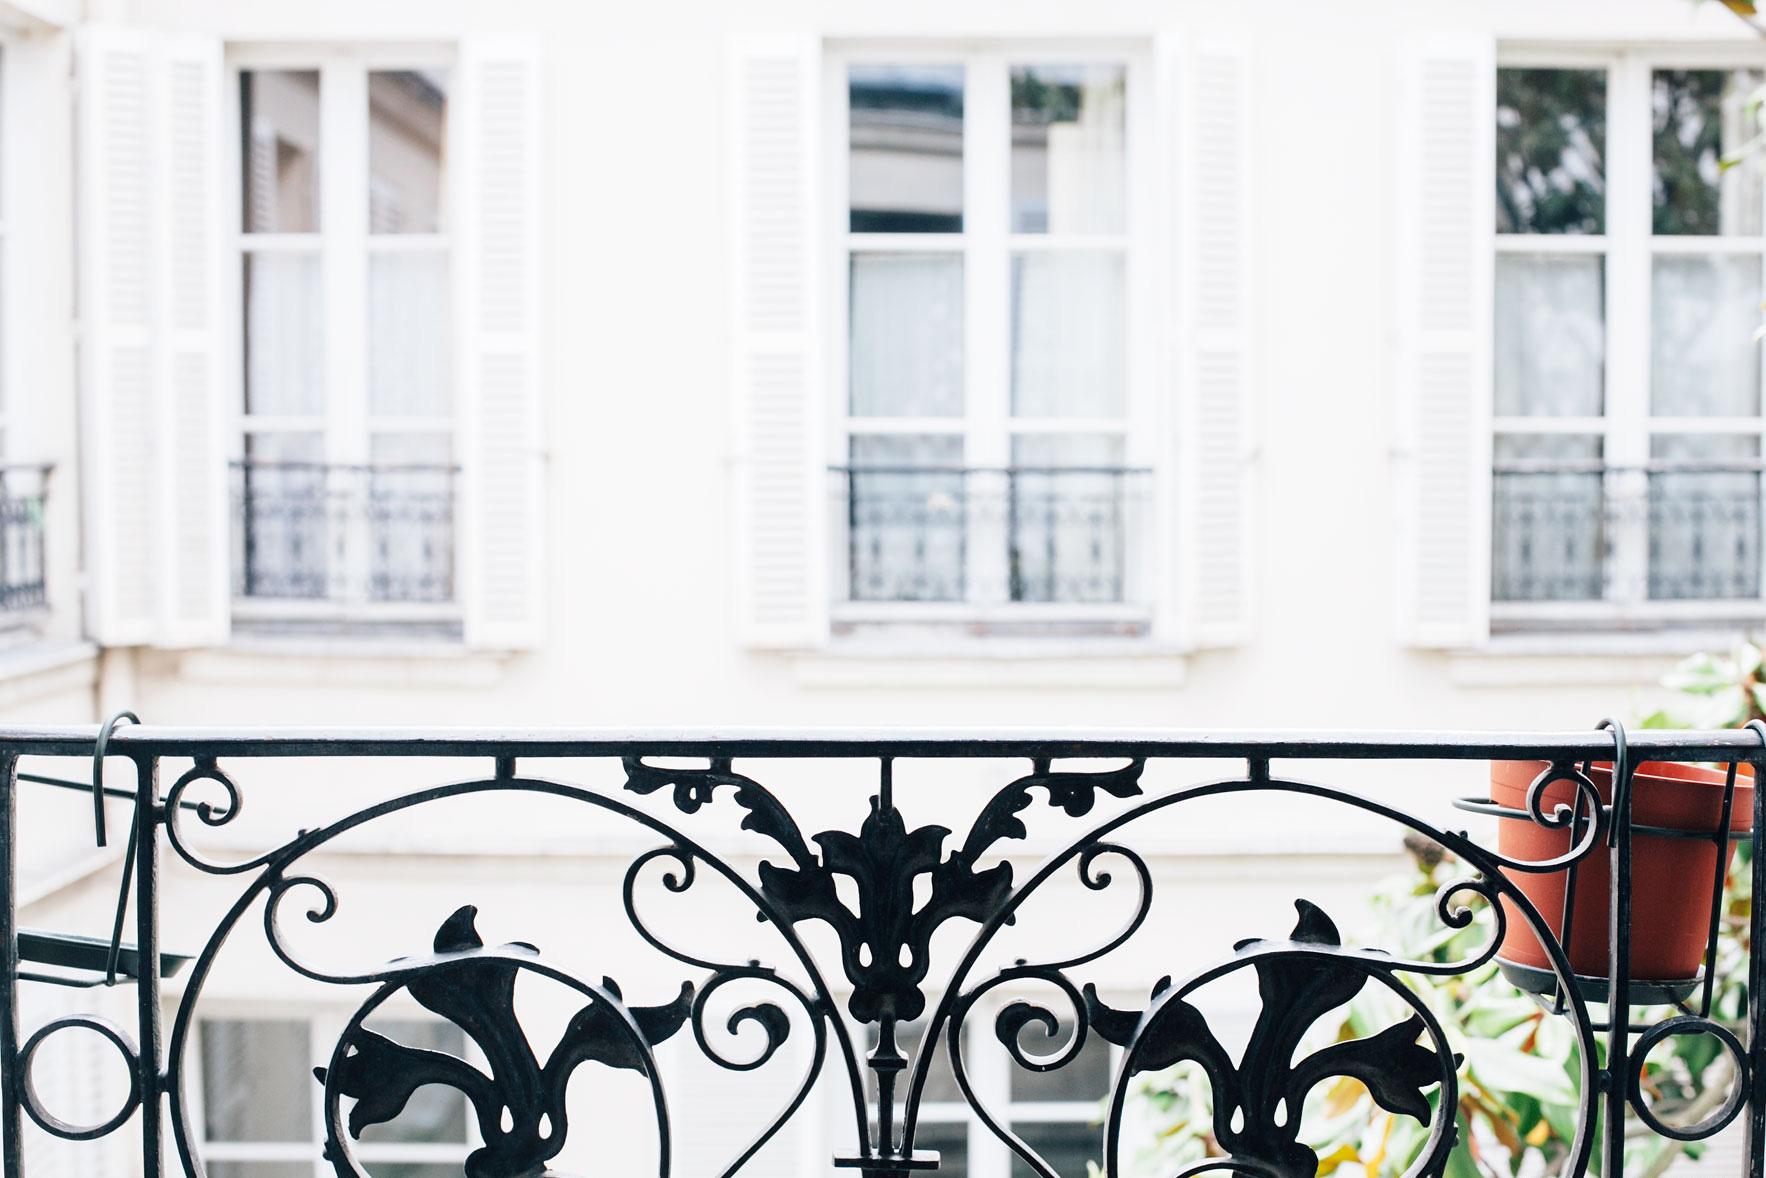 Paris photo by Carin Olsson (Paris in Four Months)